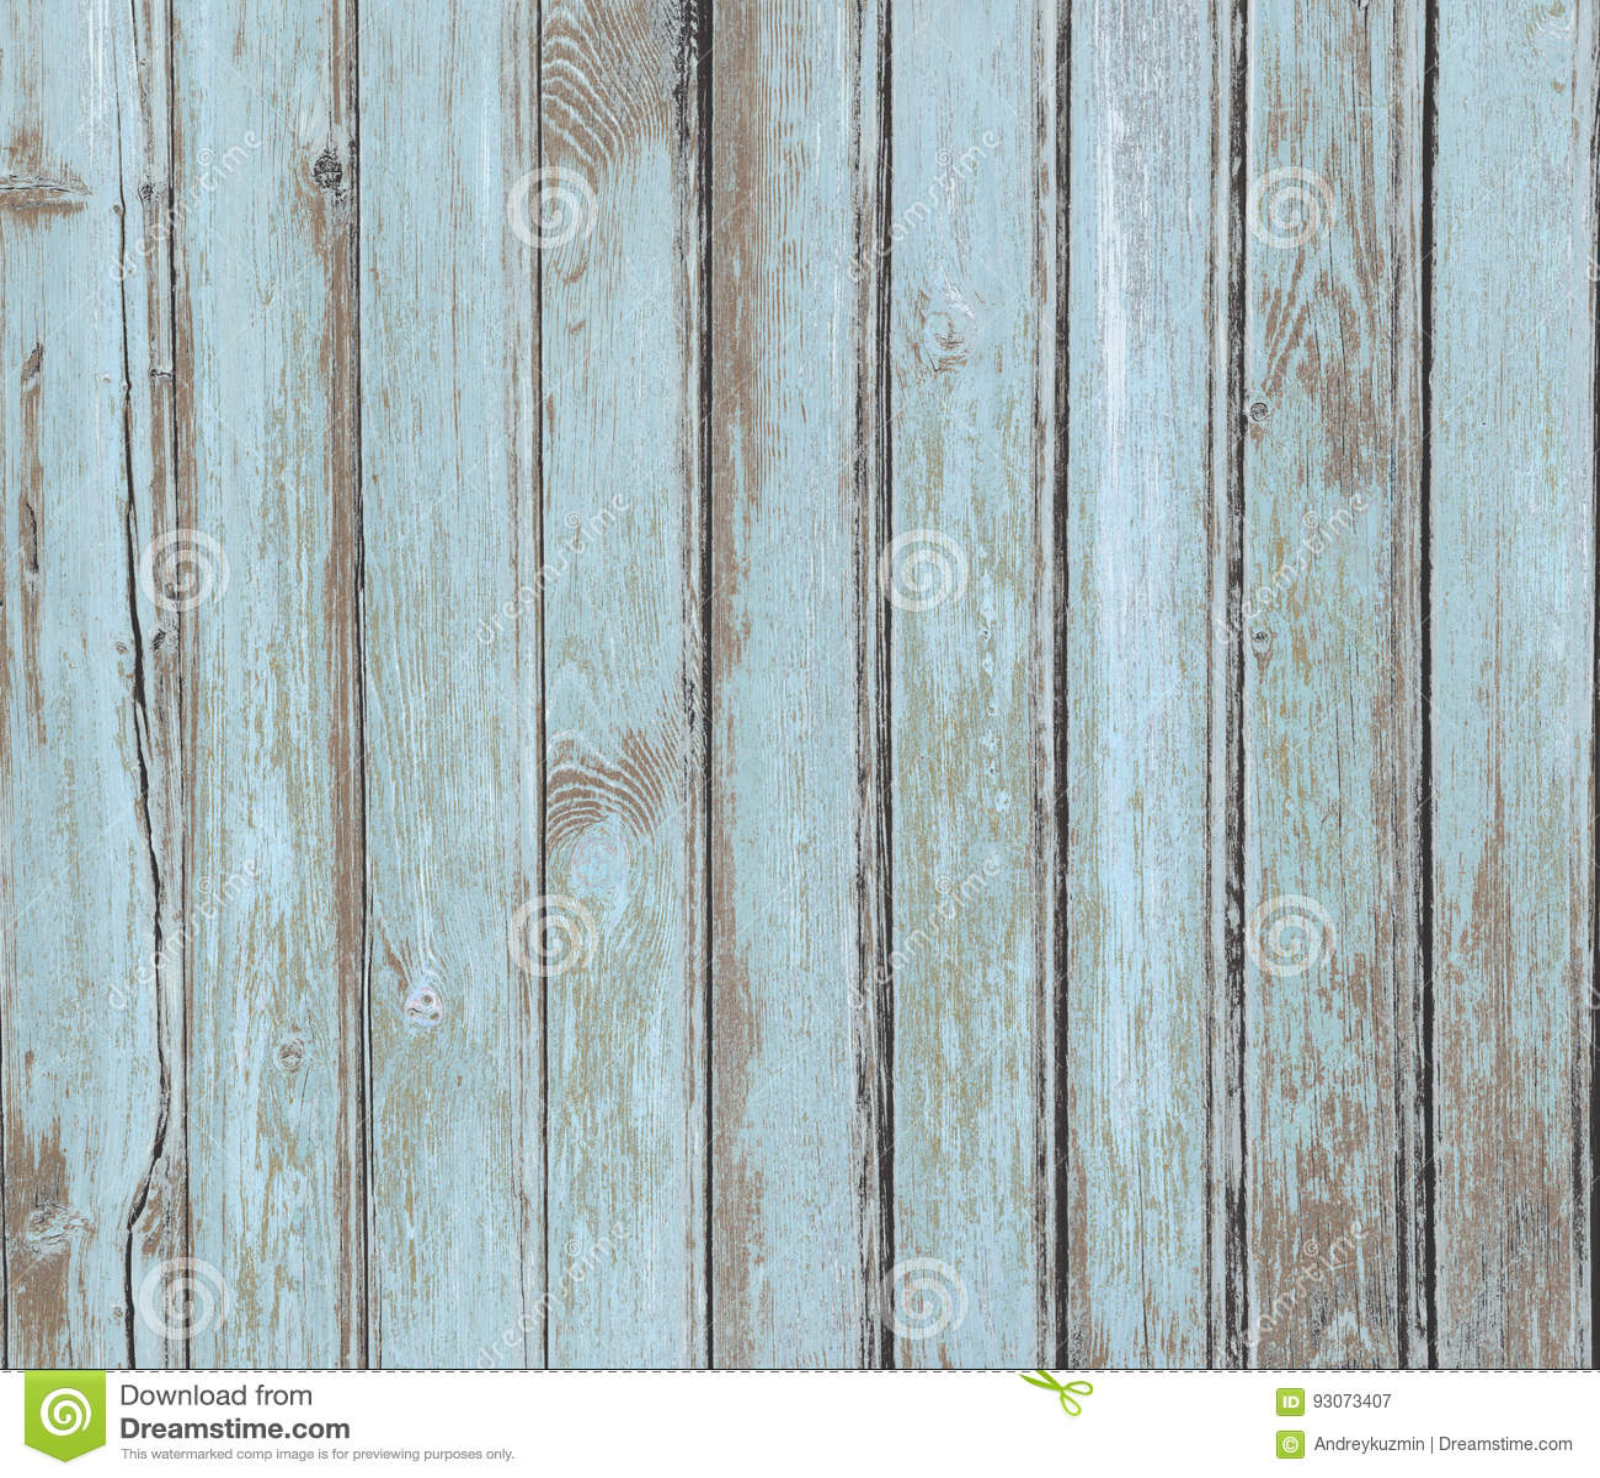 vintage blue wood background - photo #49